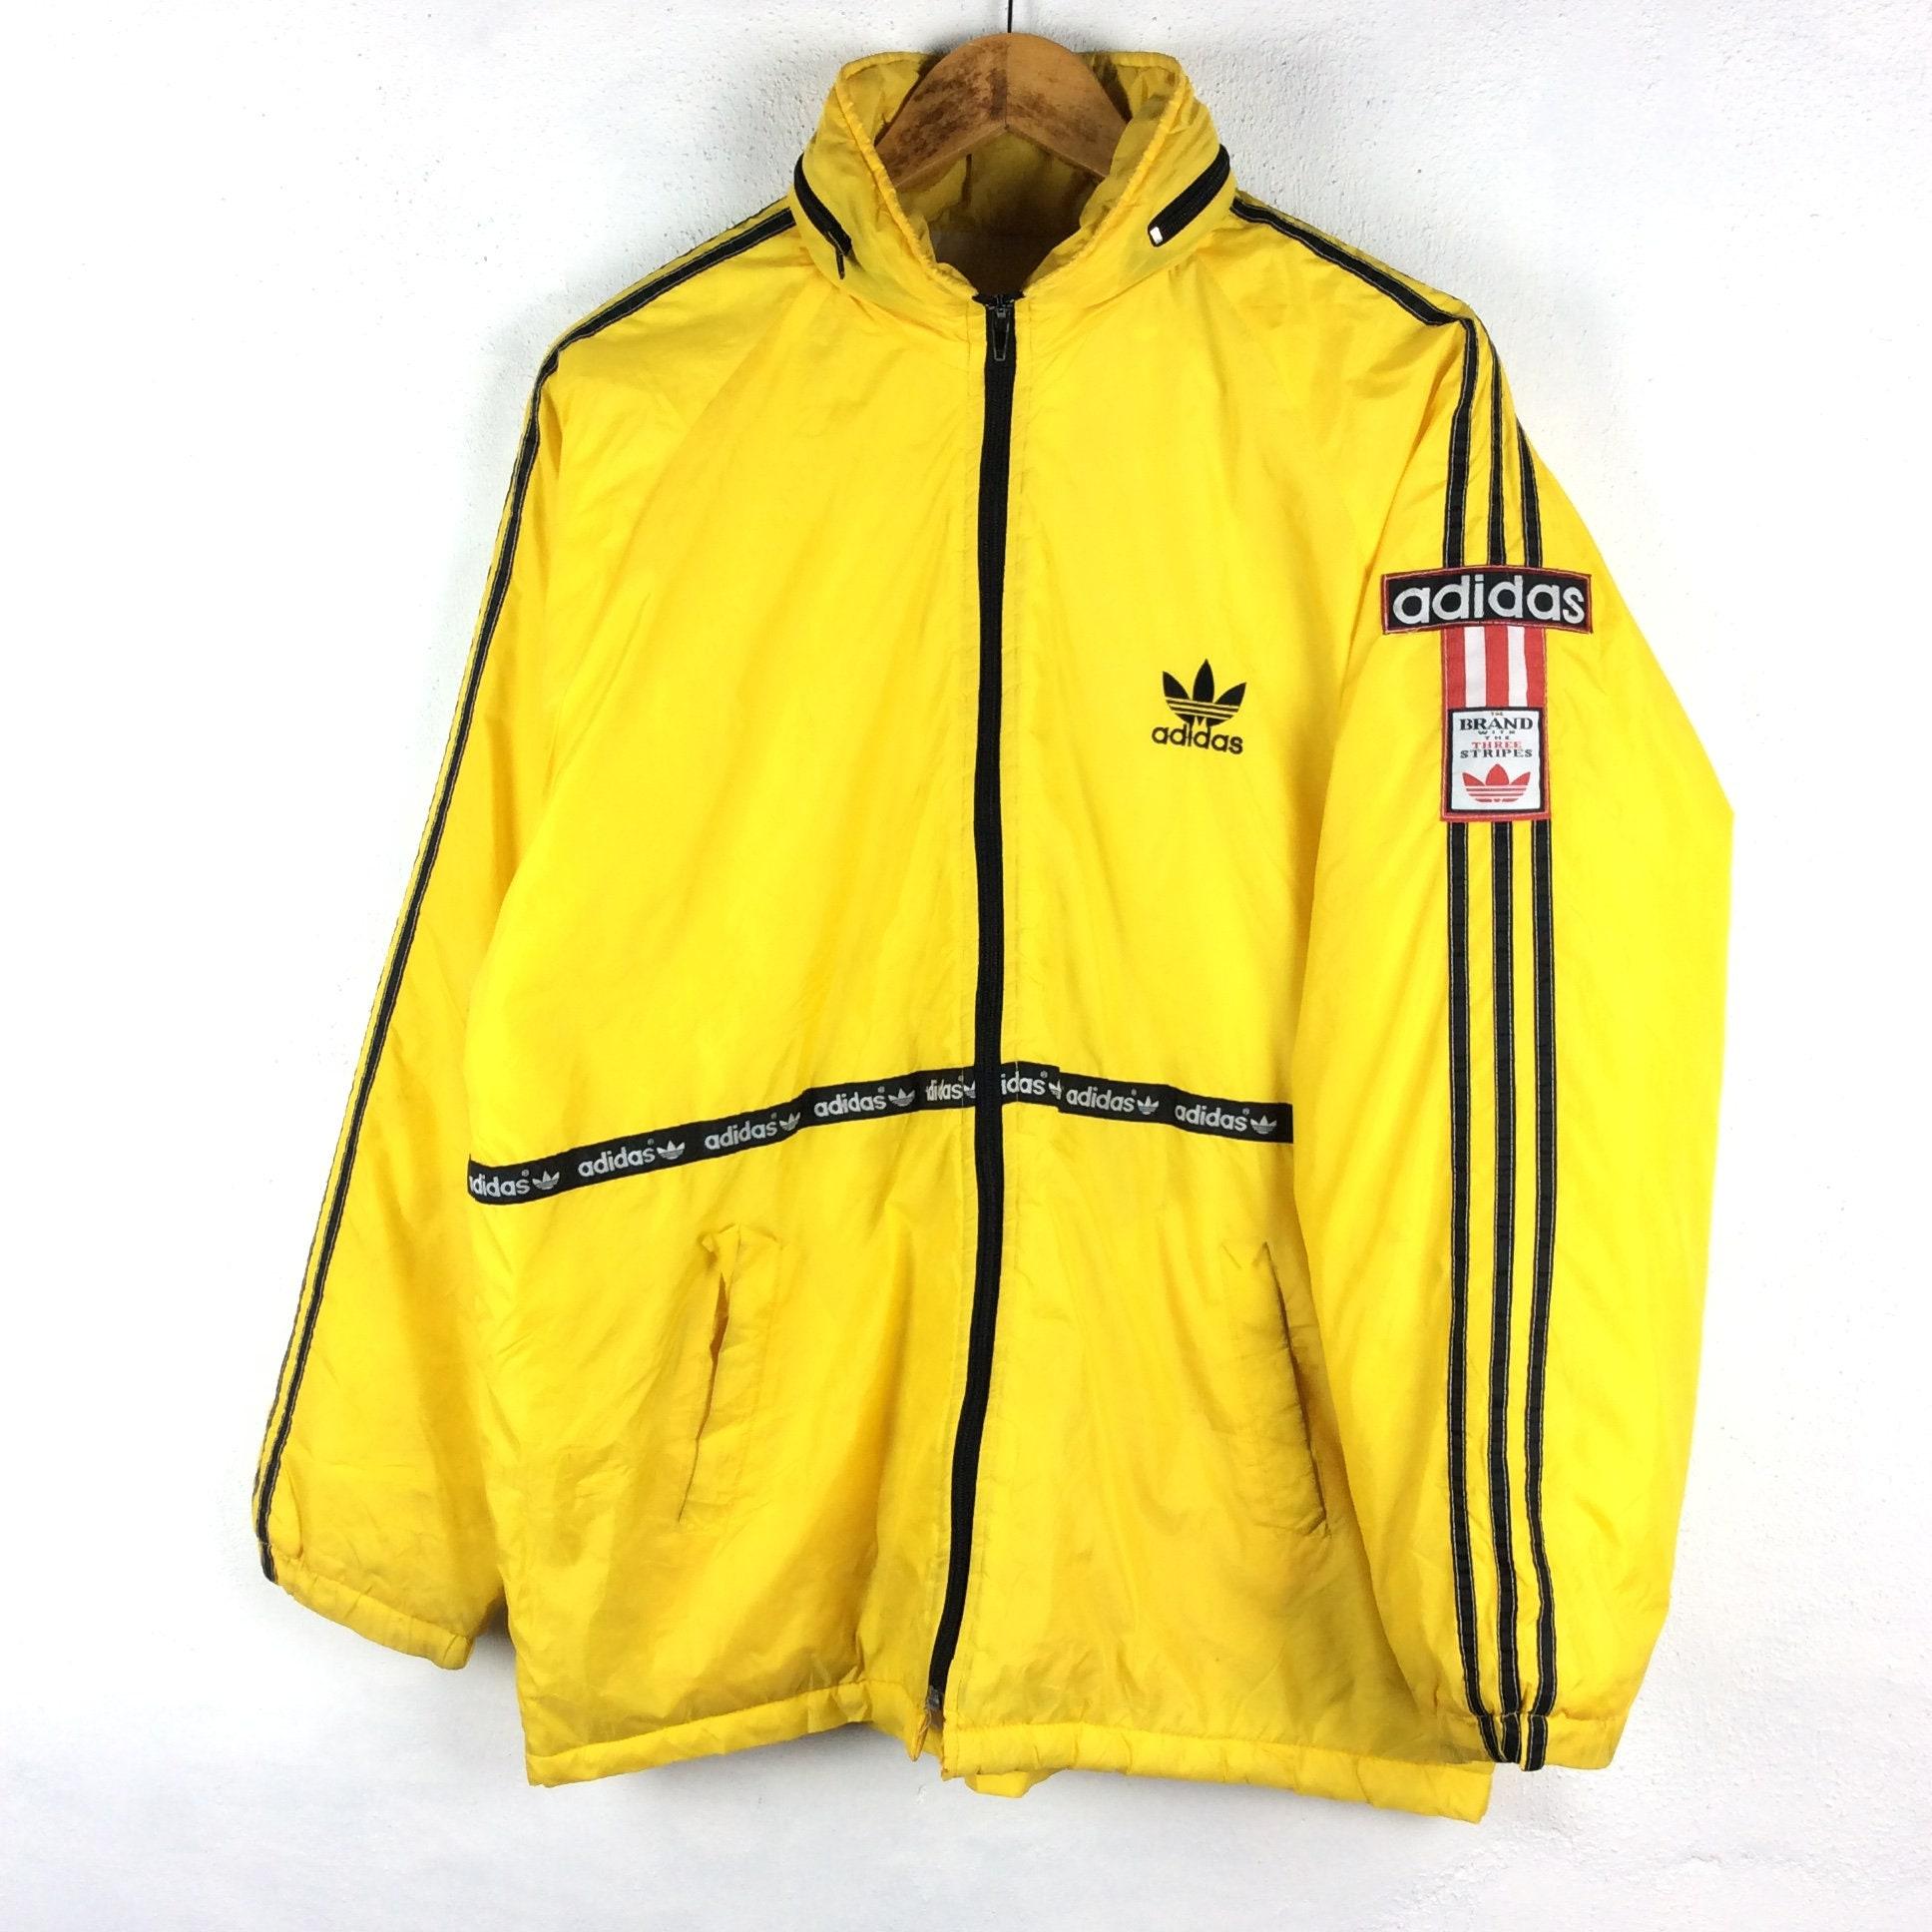 484f0175f1428 Vintage Adidas Jacket / Adidas Puffer Jacket / Jacket / Winter Jacket /  Hoodie / Vintage 90s Rap Tees Hip Hop Swag